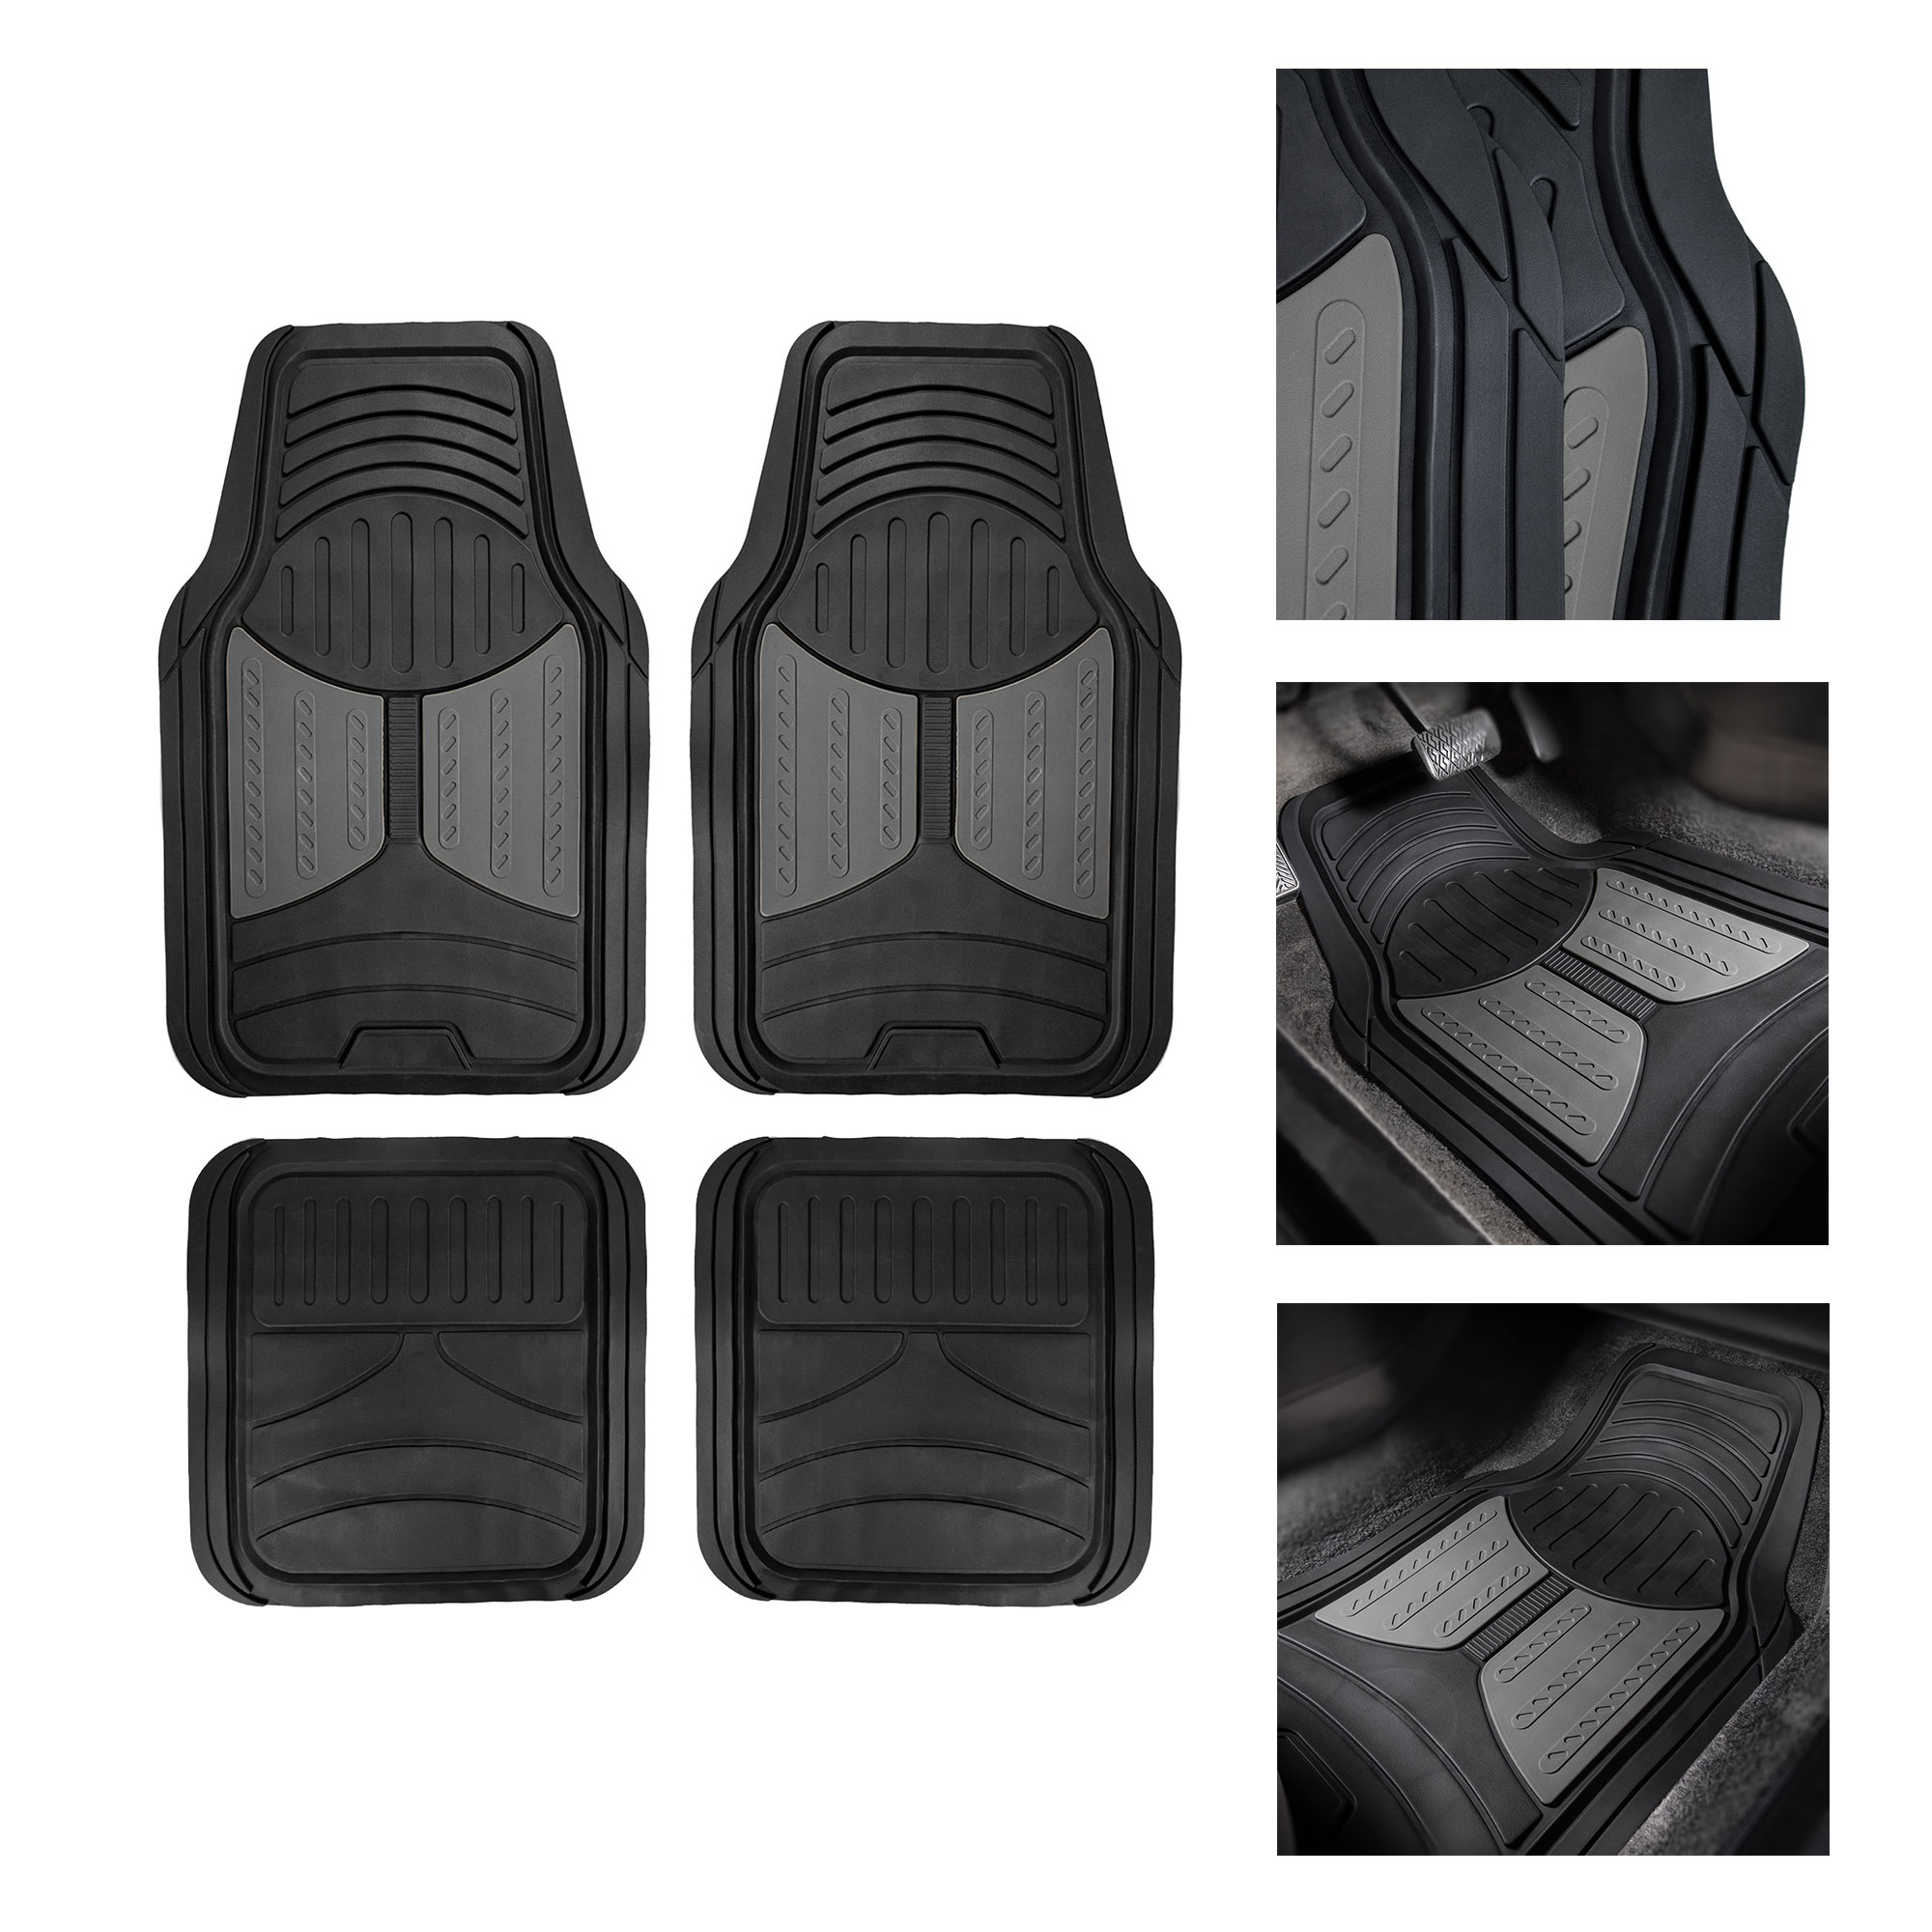 Gray Black Carpet Floor Mats for Car Sedan SUV Van Universal Fitment FREE GIFT